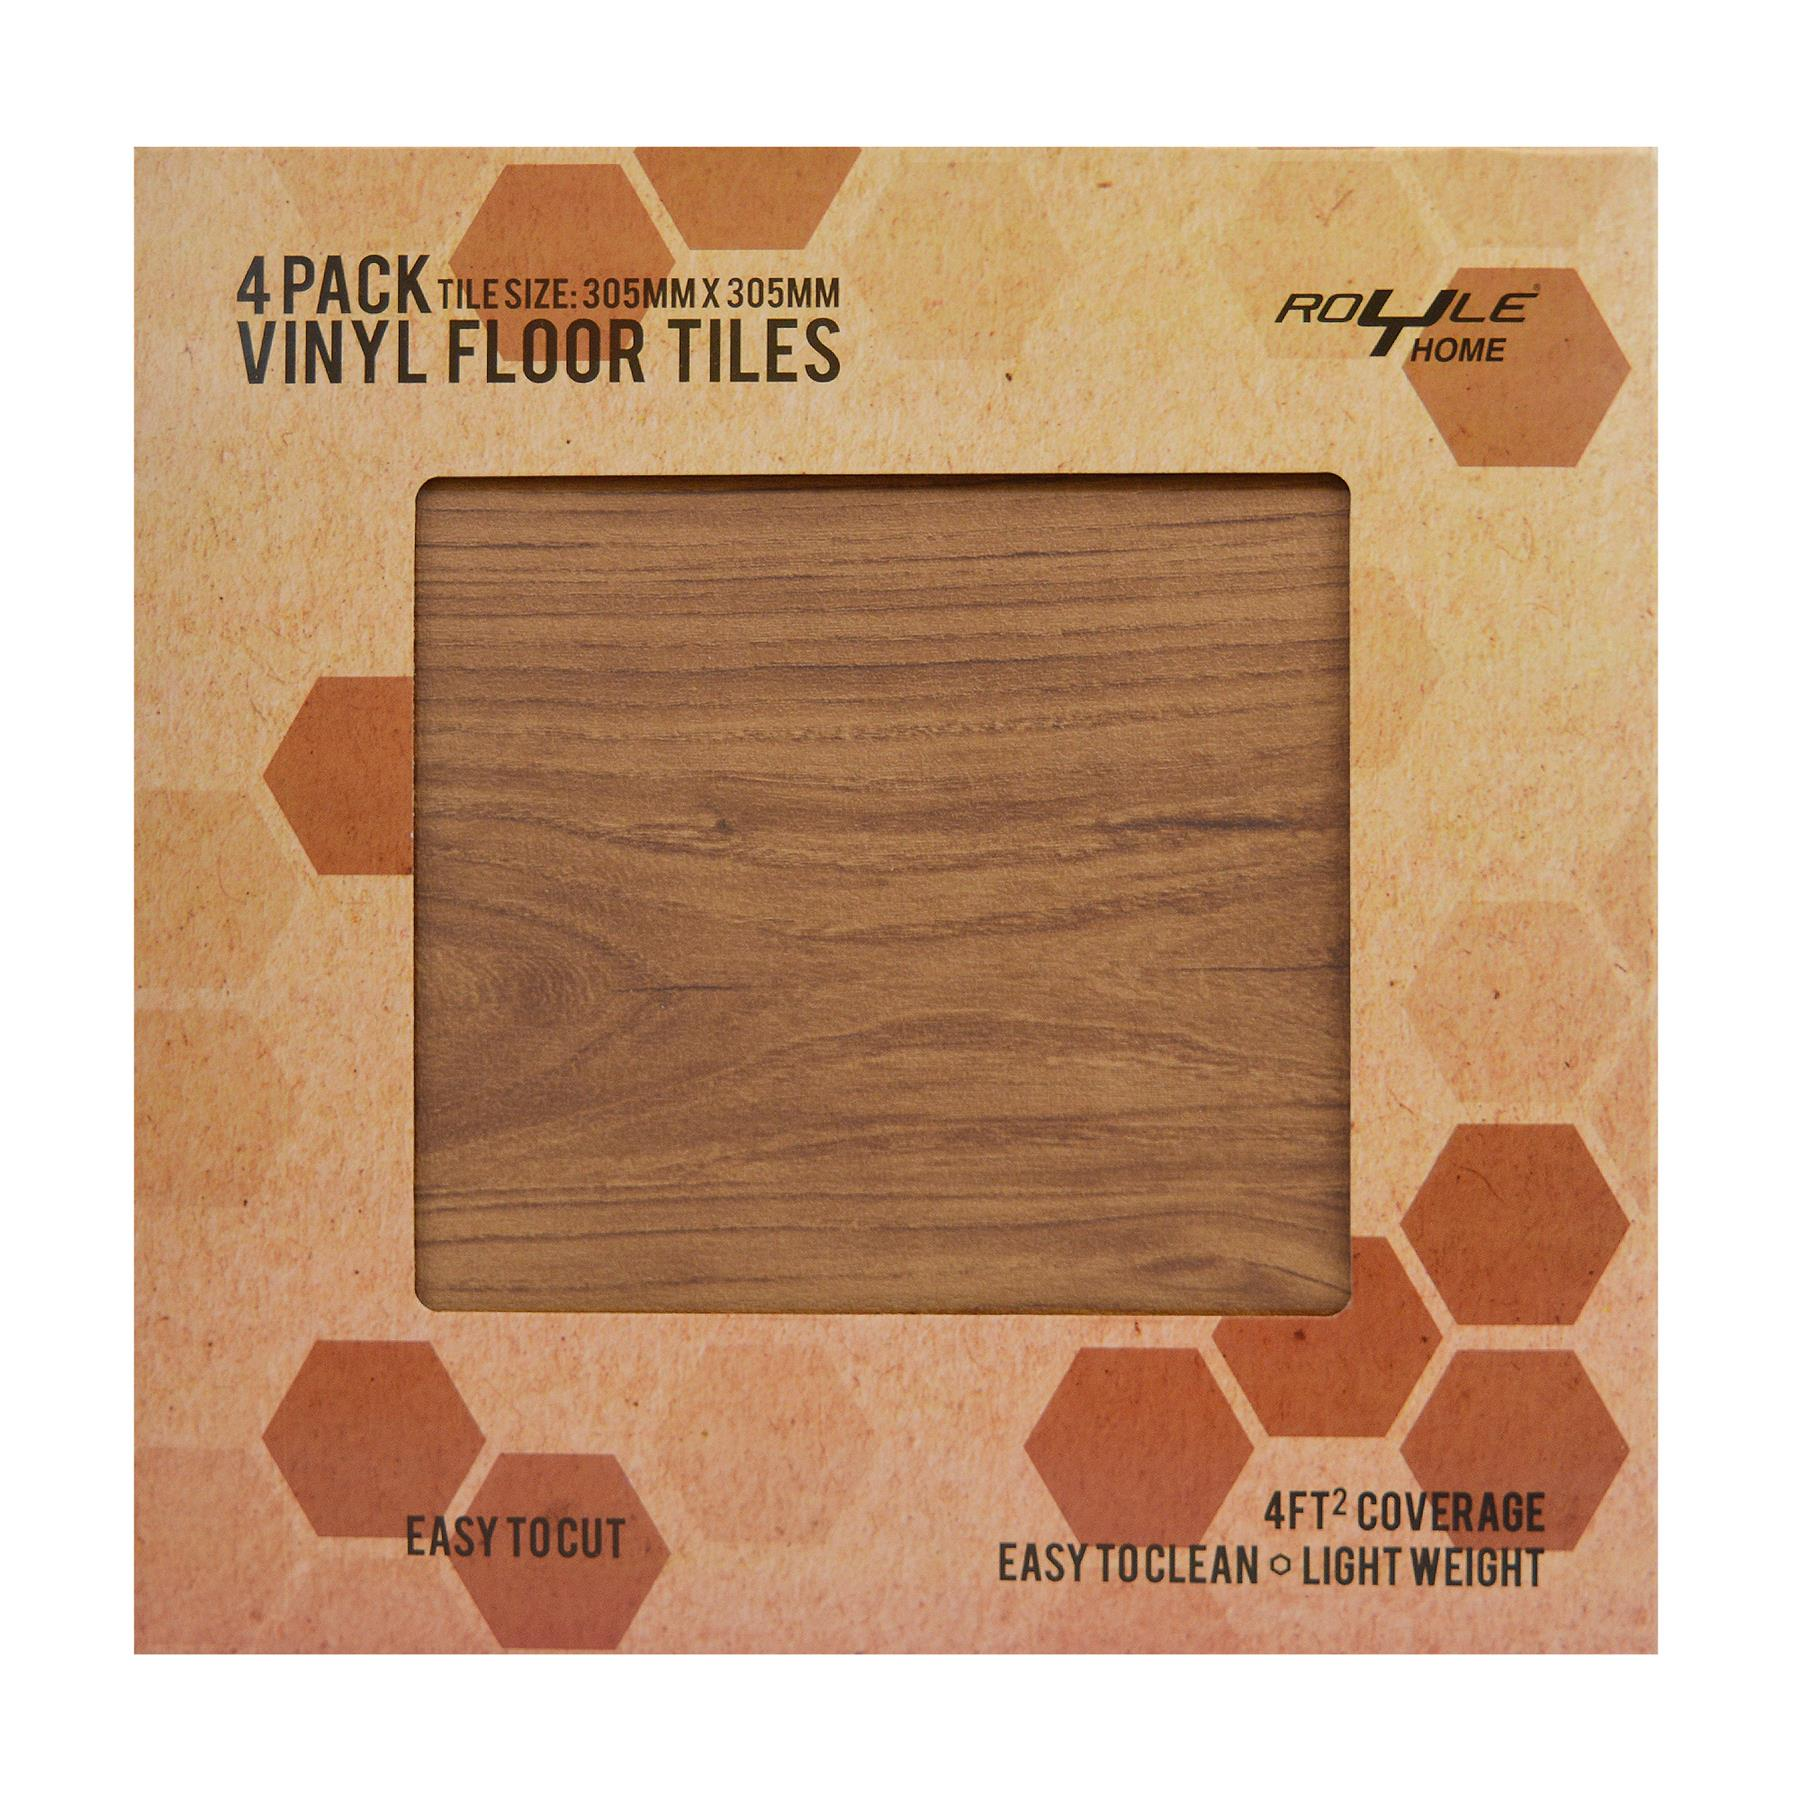 Floor-Tiles-Self-Adhesive-Vinyl-Flooring-Kitchen-Bathroom-Brown-Wood-Grain thumbnail 24